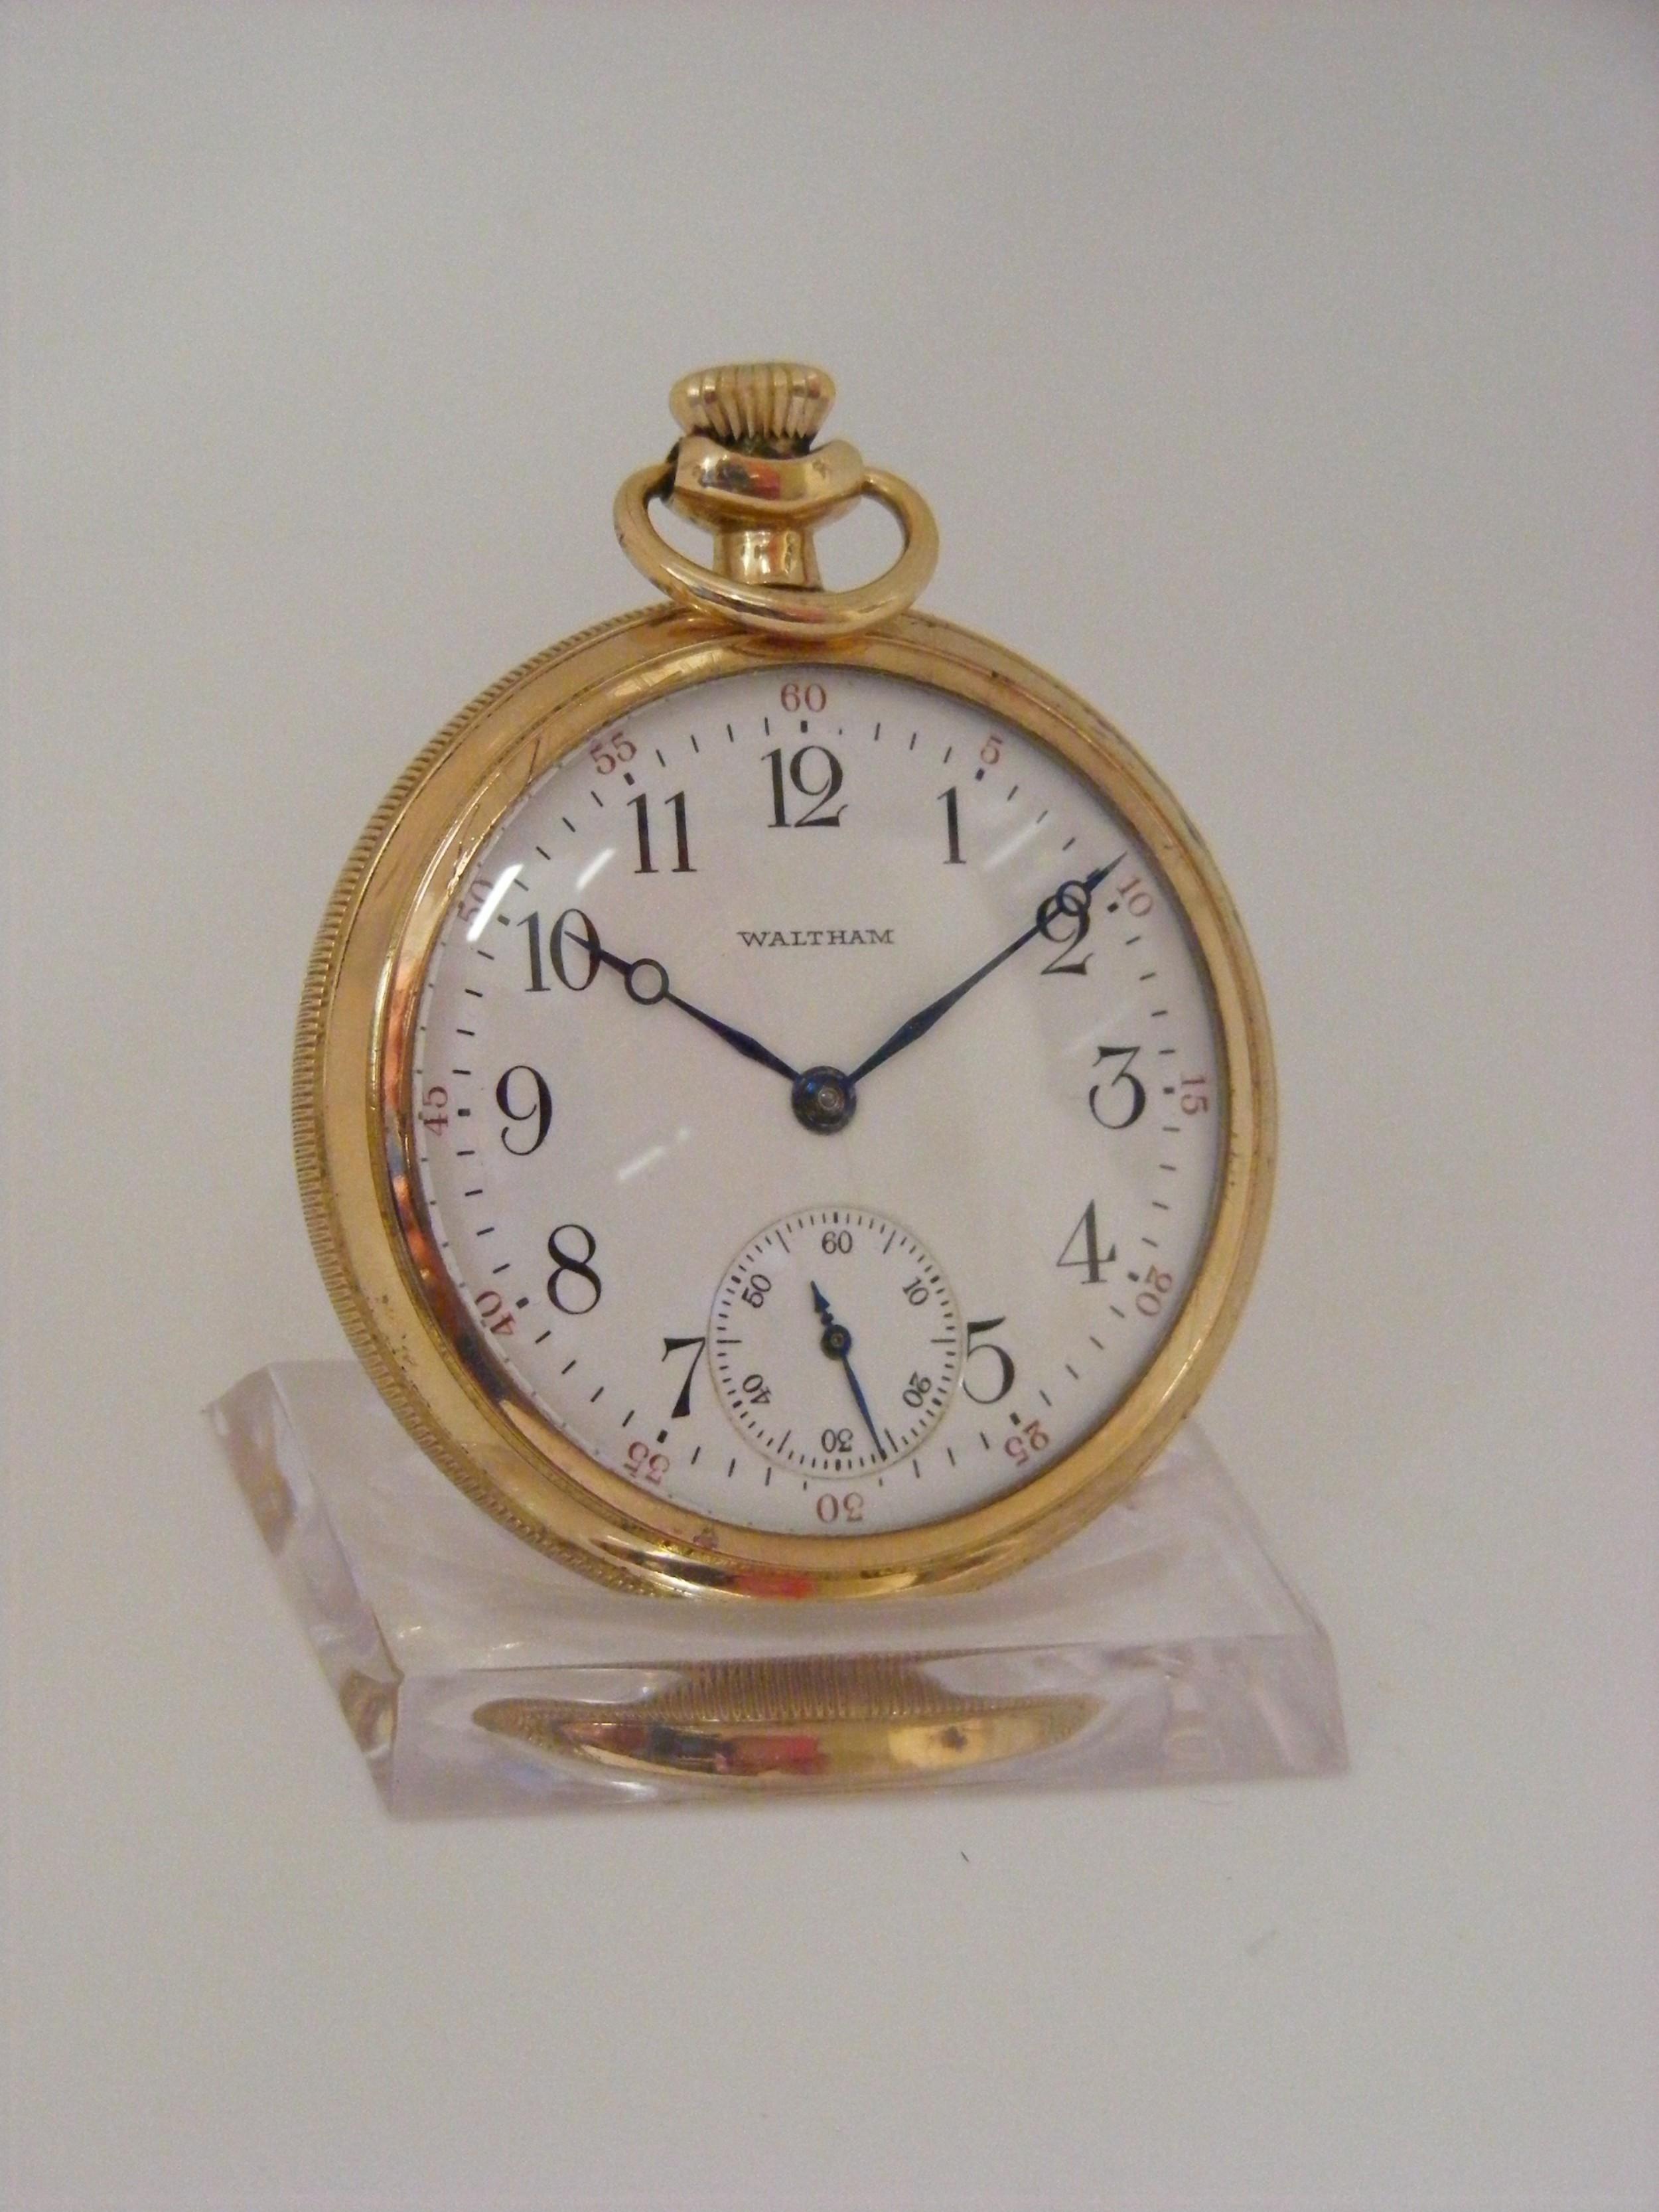 waltham 15j open face pocket watch serviced warranted